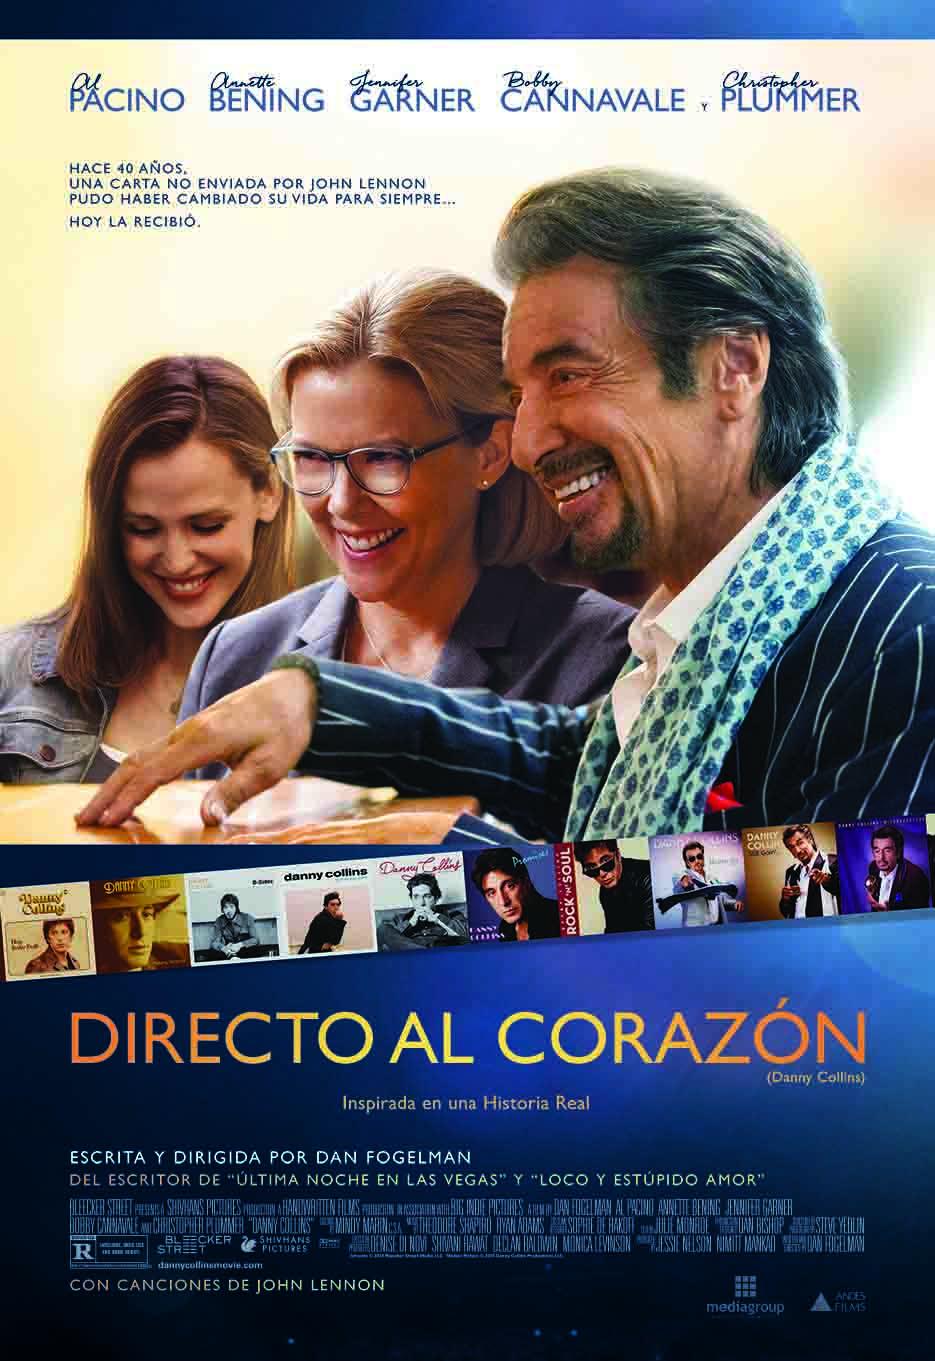 https://www.andesfilms.com.pe/directo-al-corazon/